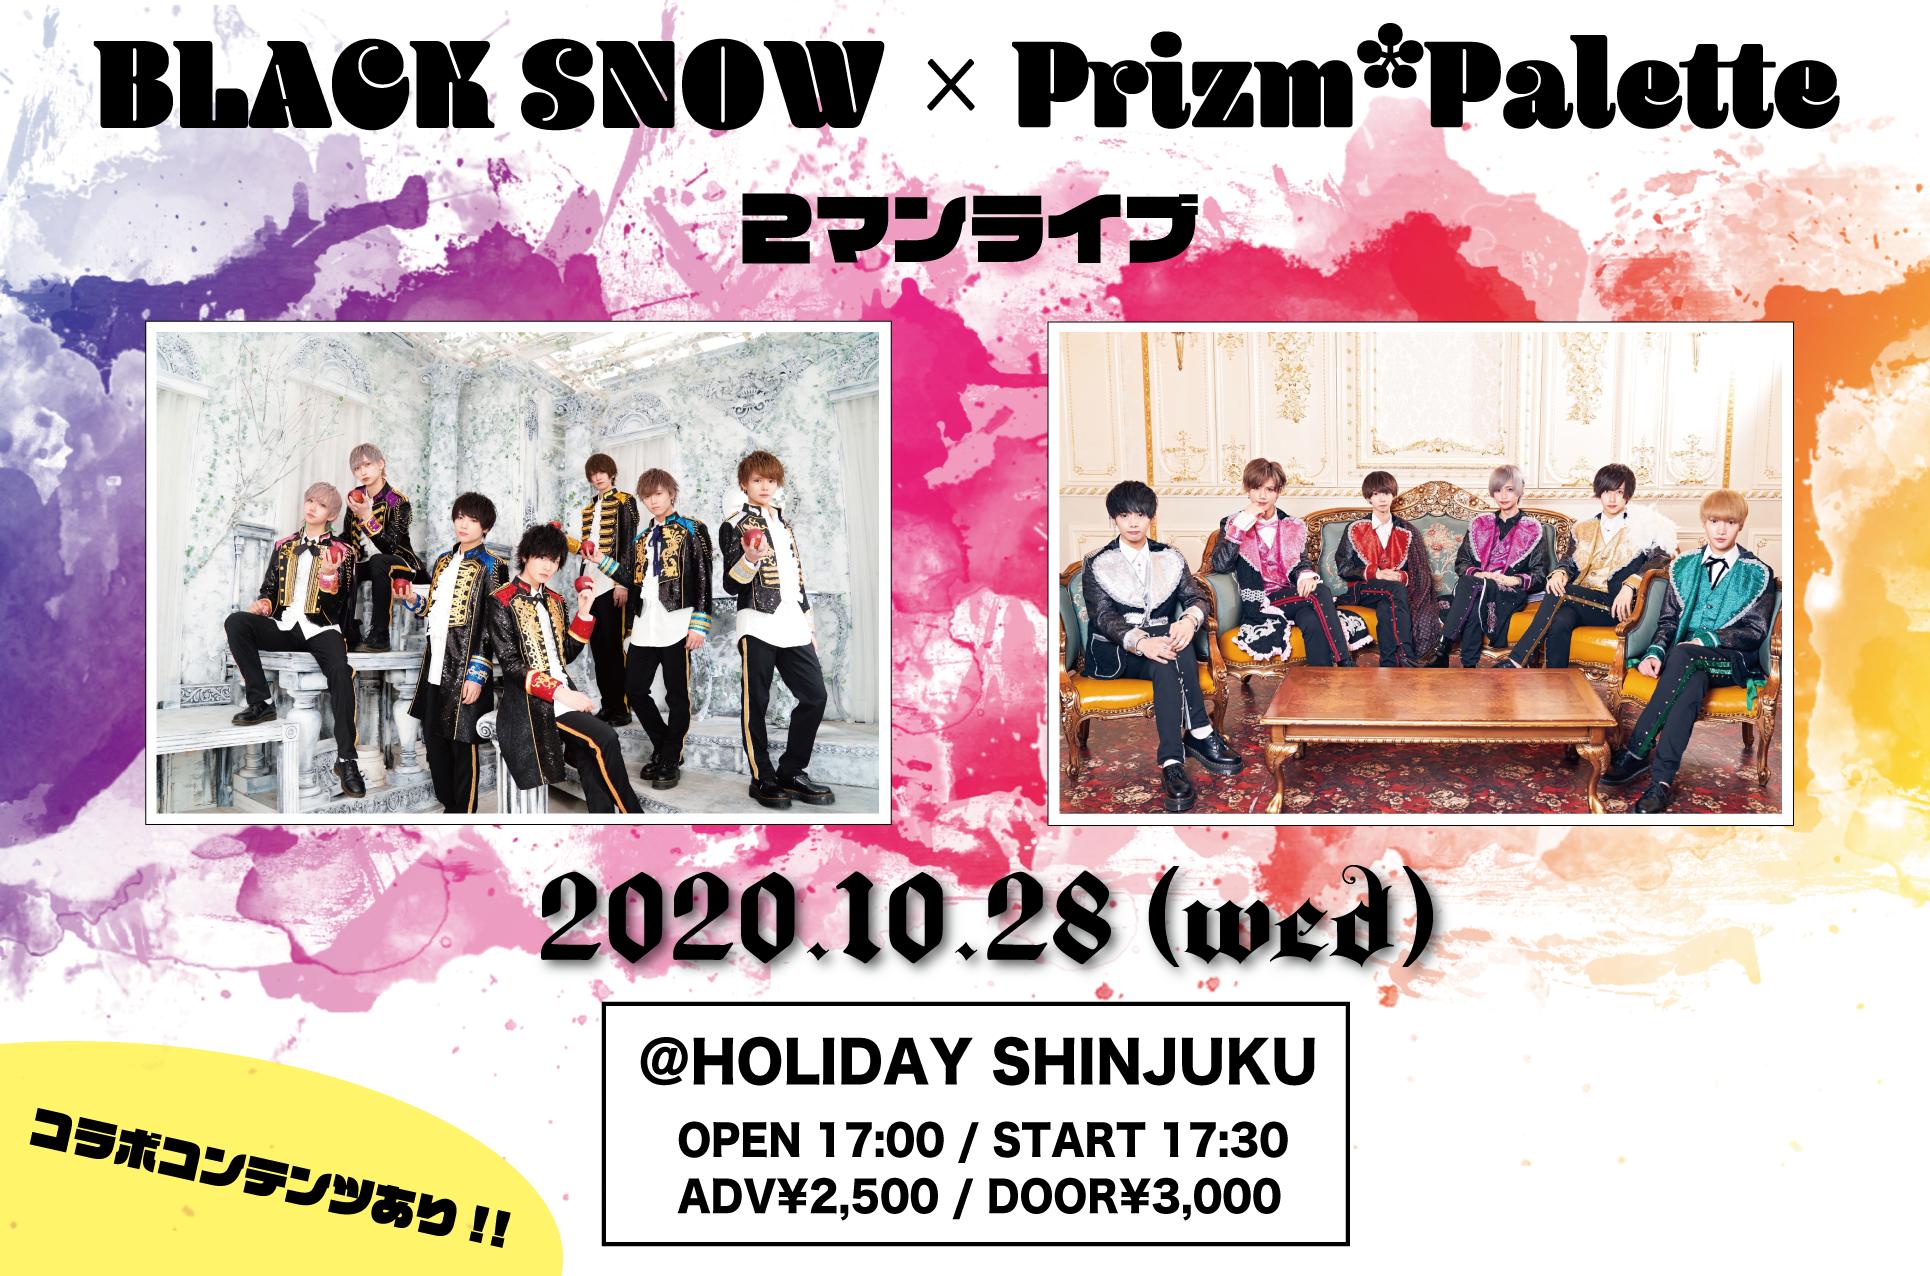 BLACK SNOW × Prizm*Palette 2マンライブ